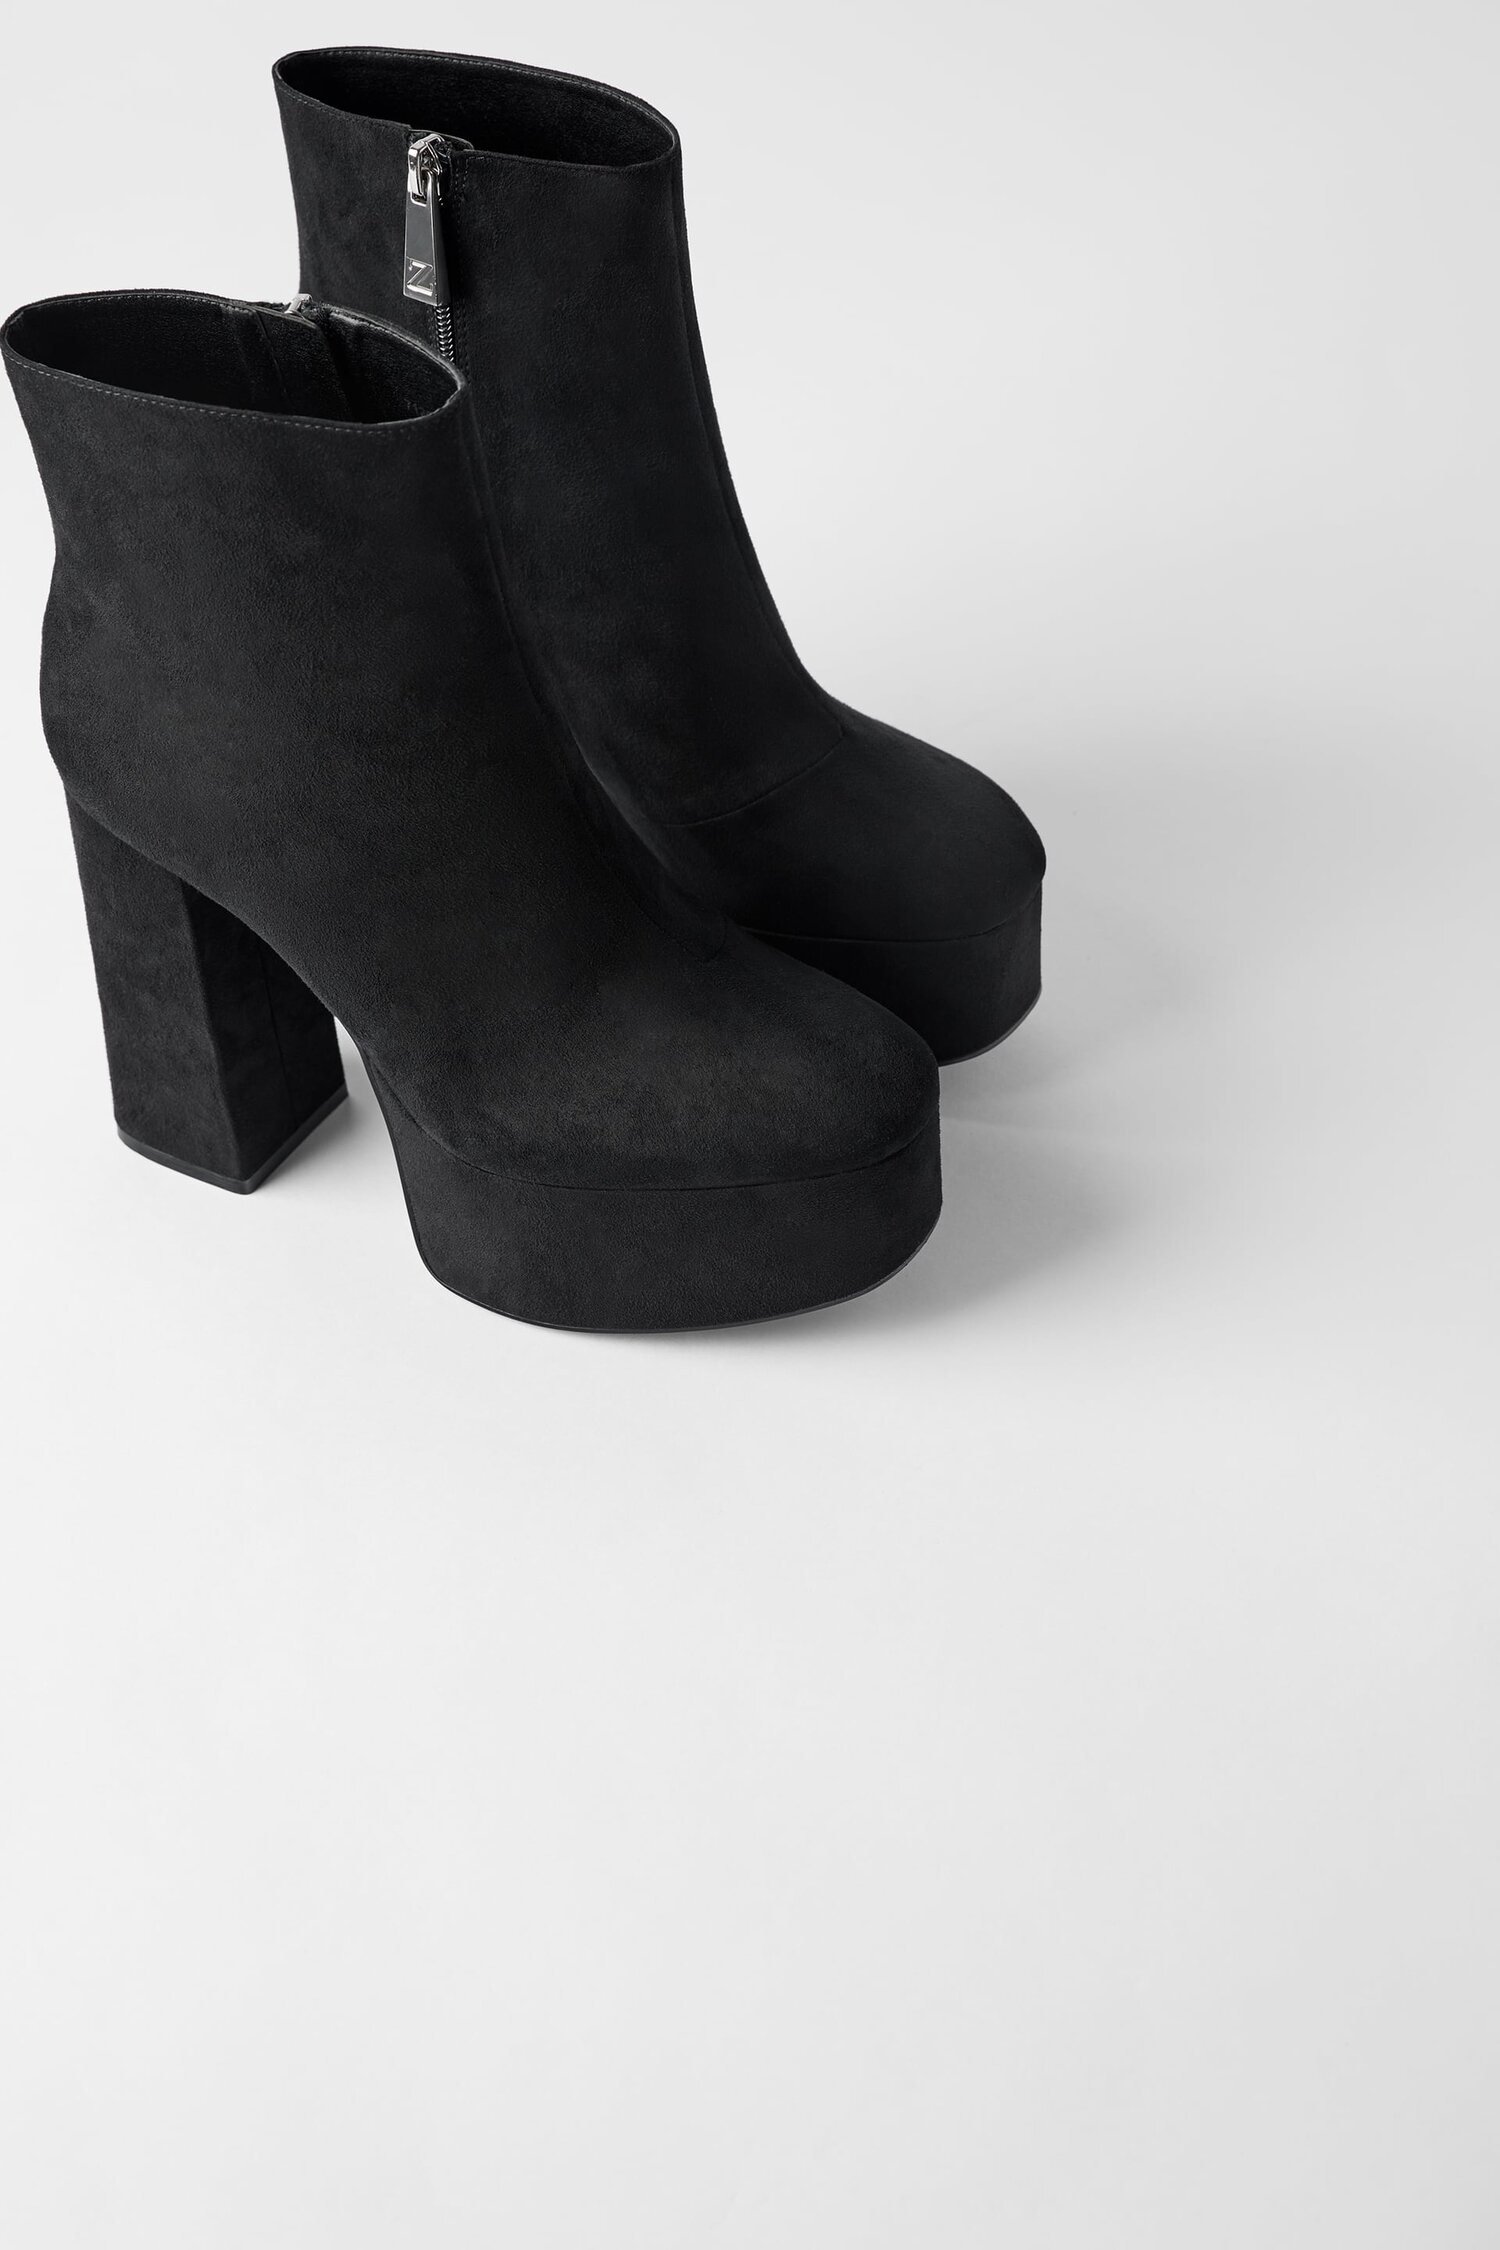 Zara Platform Ankle Boots